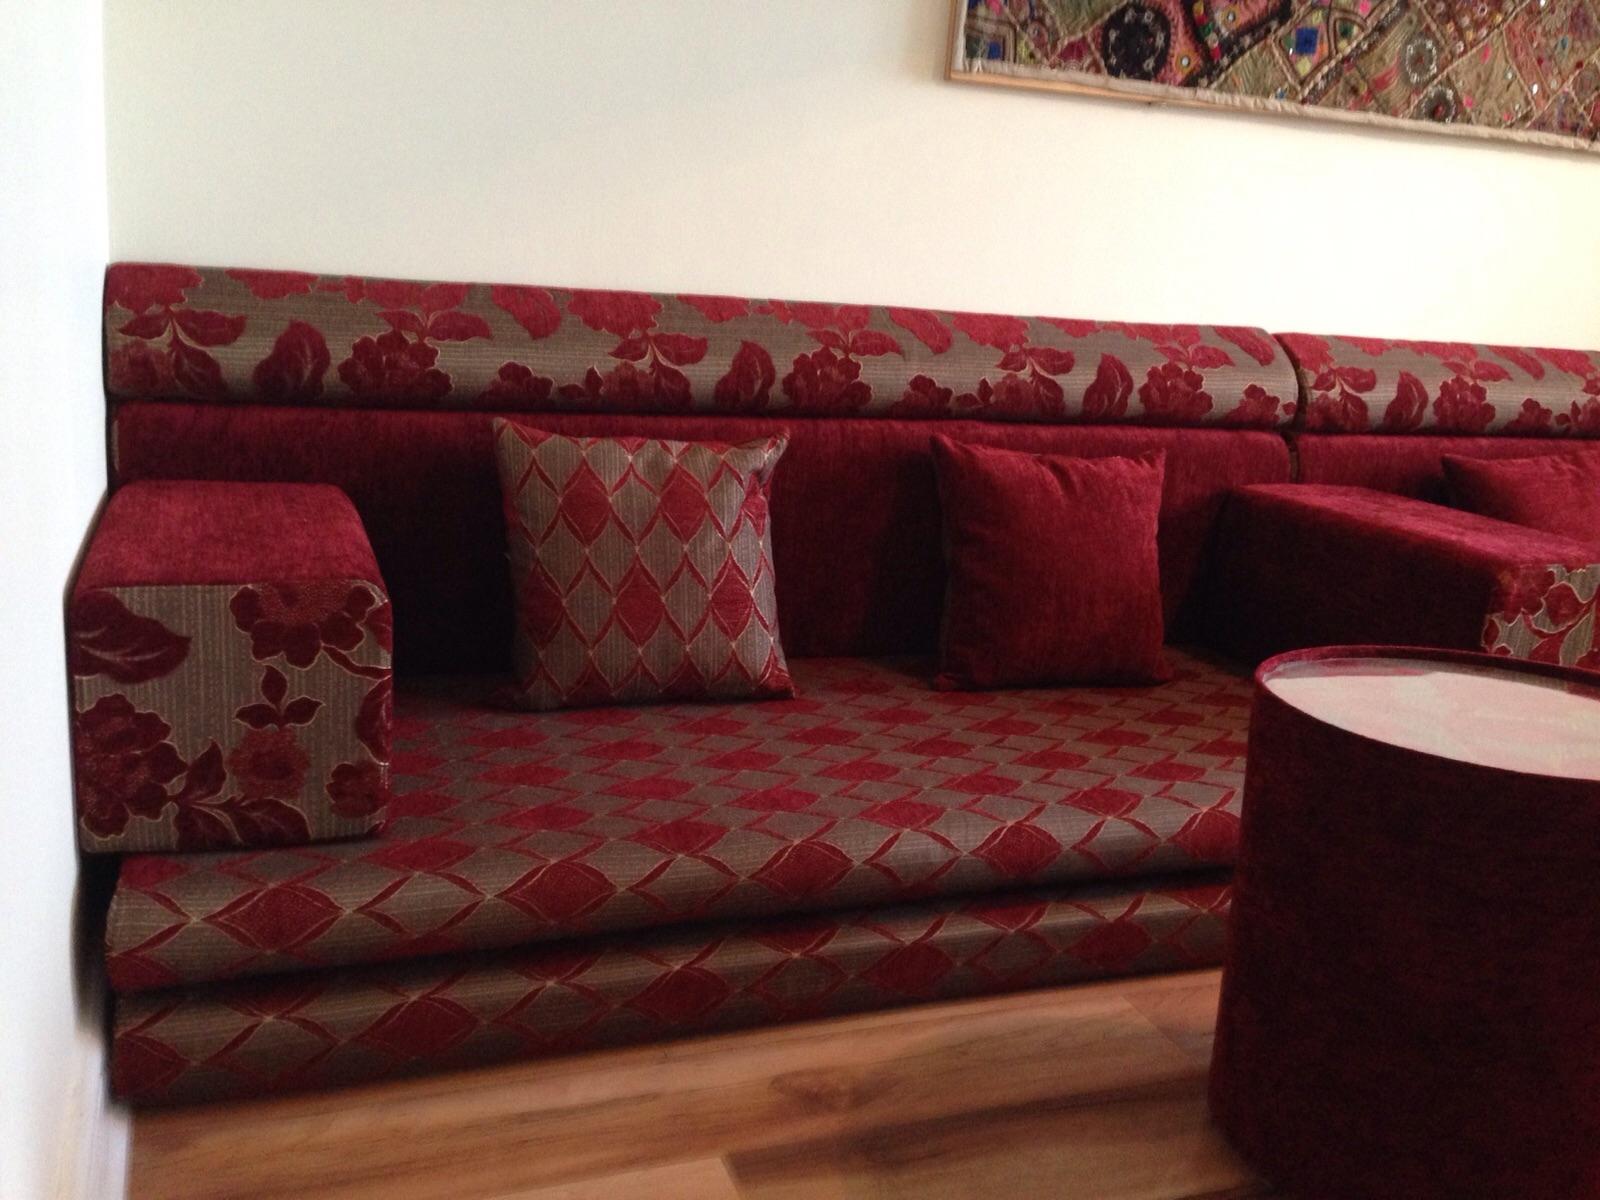 floor seating sofa uk cama chaise longue con arcon 15 photos moroccan cushions ideas